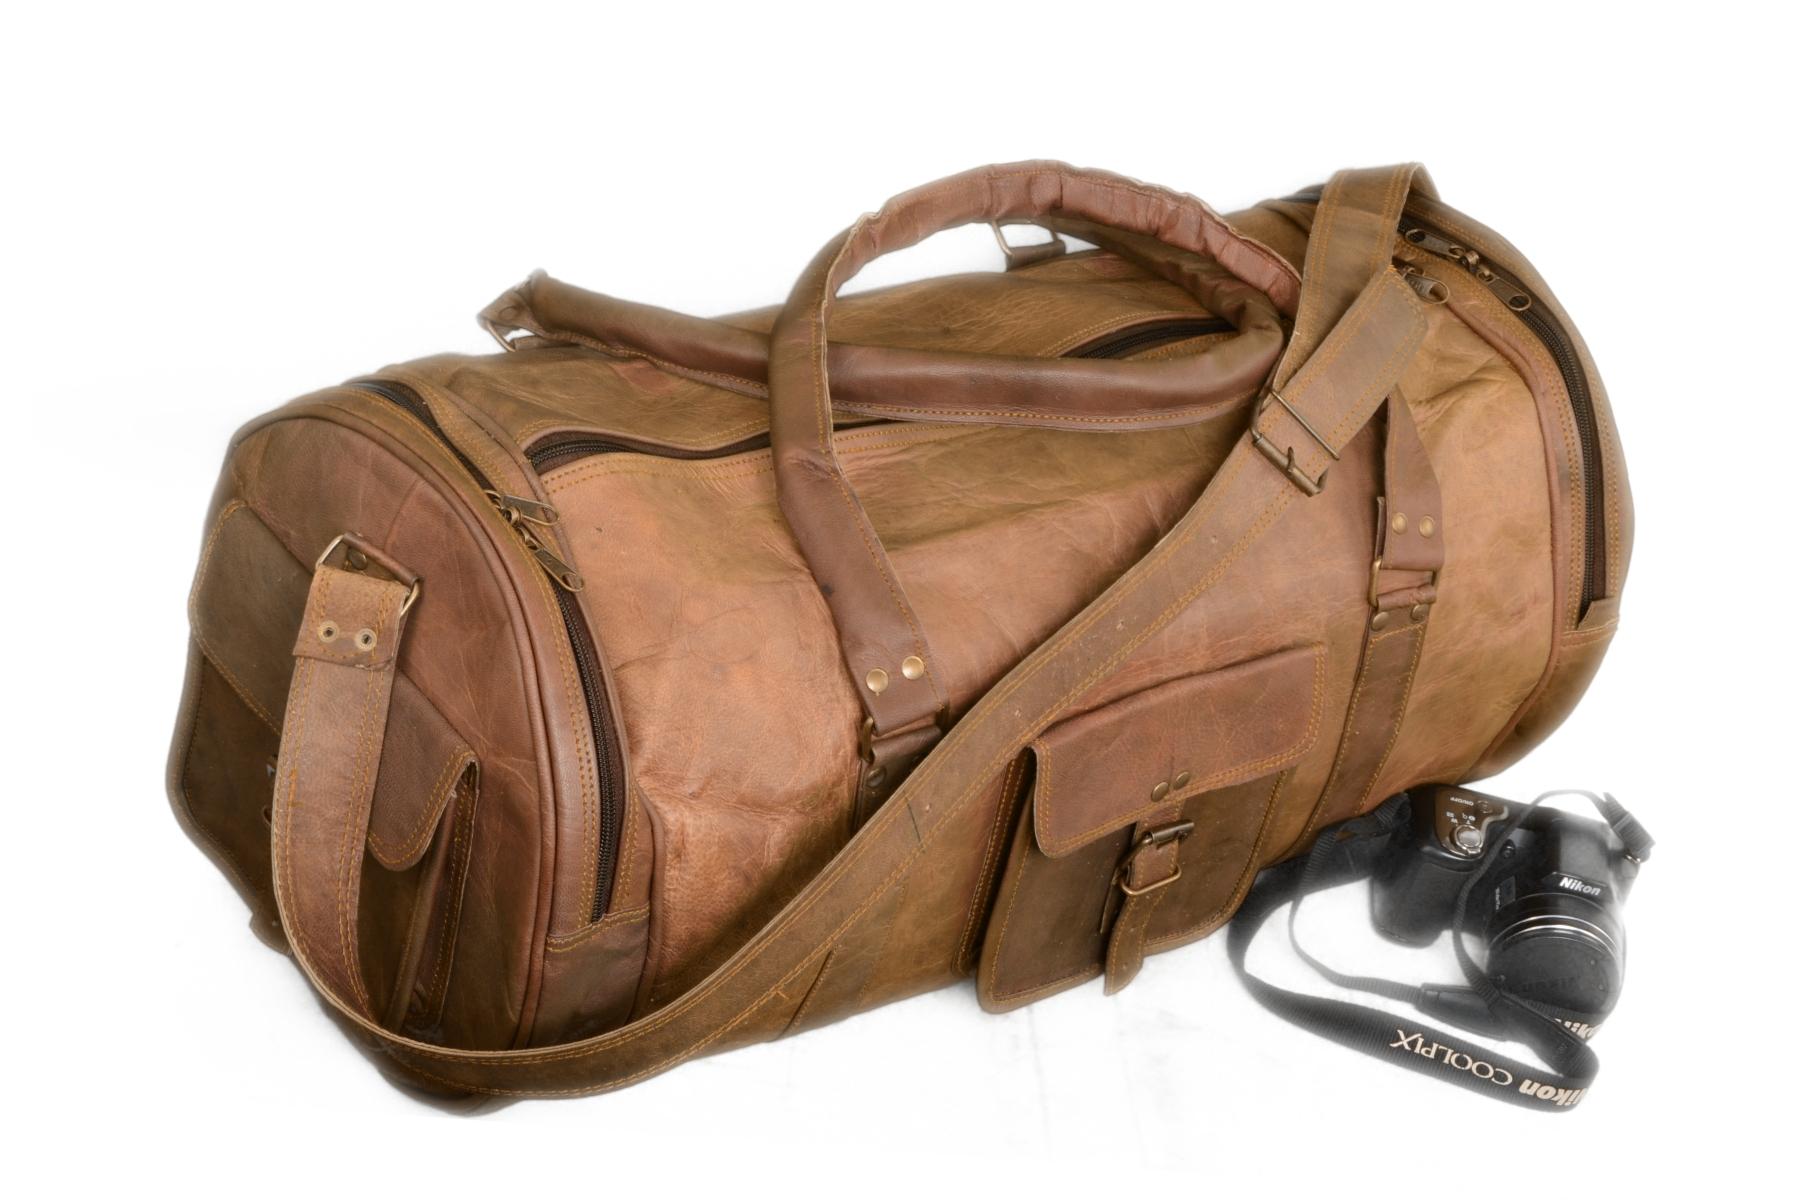 Real 28 Inch Genuine Handmade Goat Leather Vintage Look Duffel Bag ... f41fc2fd3599